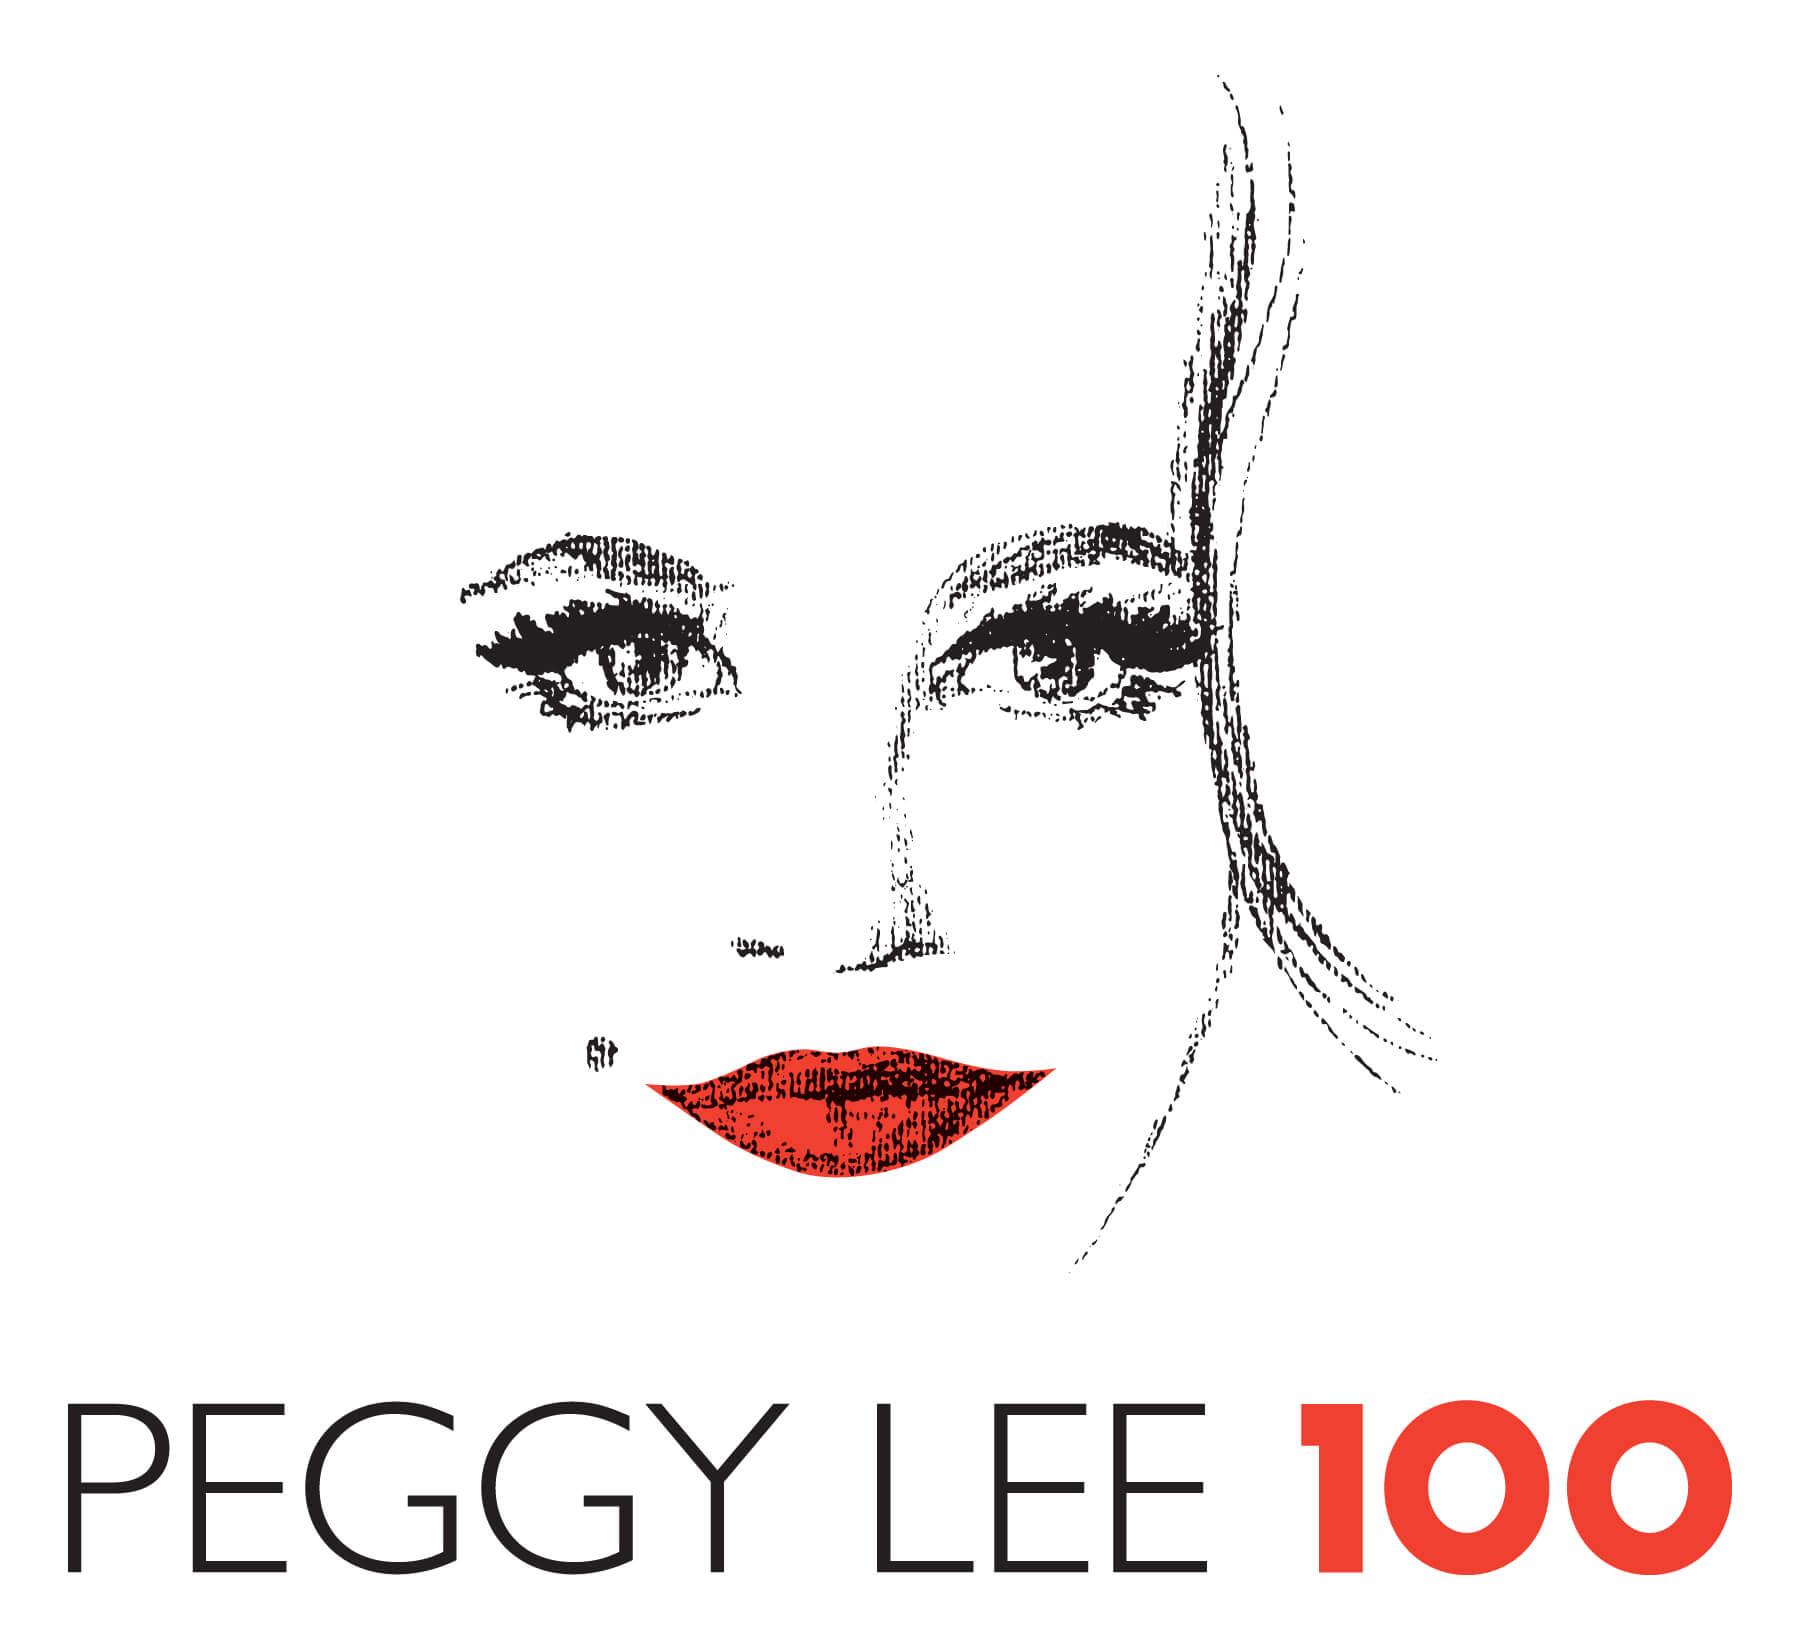 Peggy Lee 100th Birthday Celebration Digital Exhibit – GRAMMY Museum